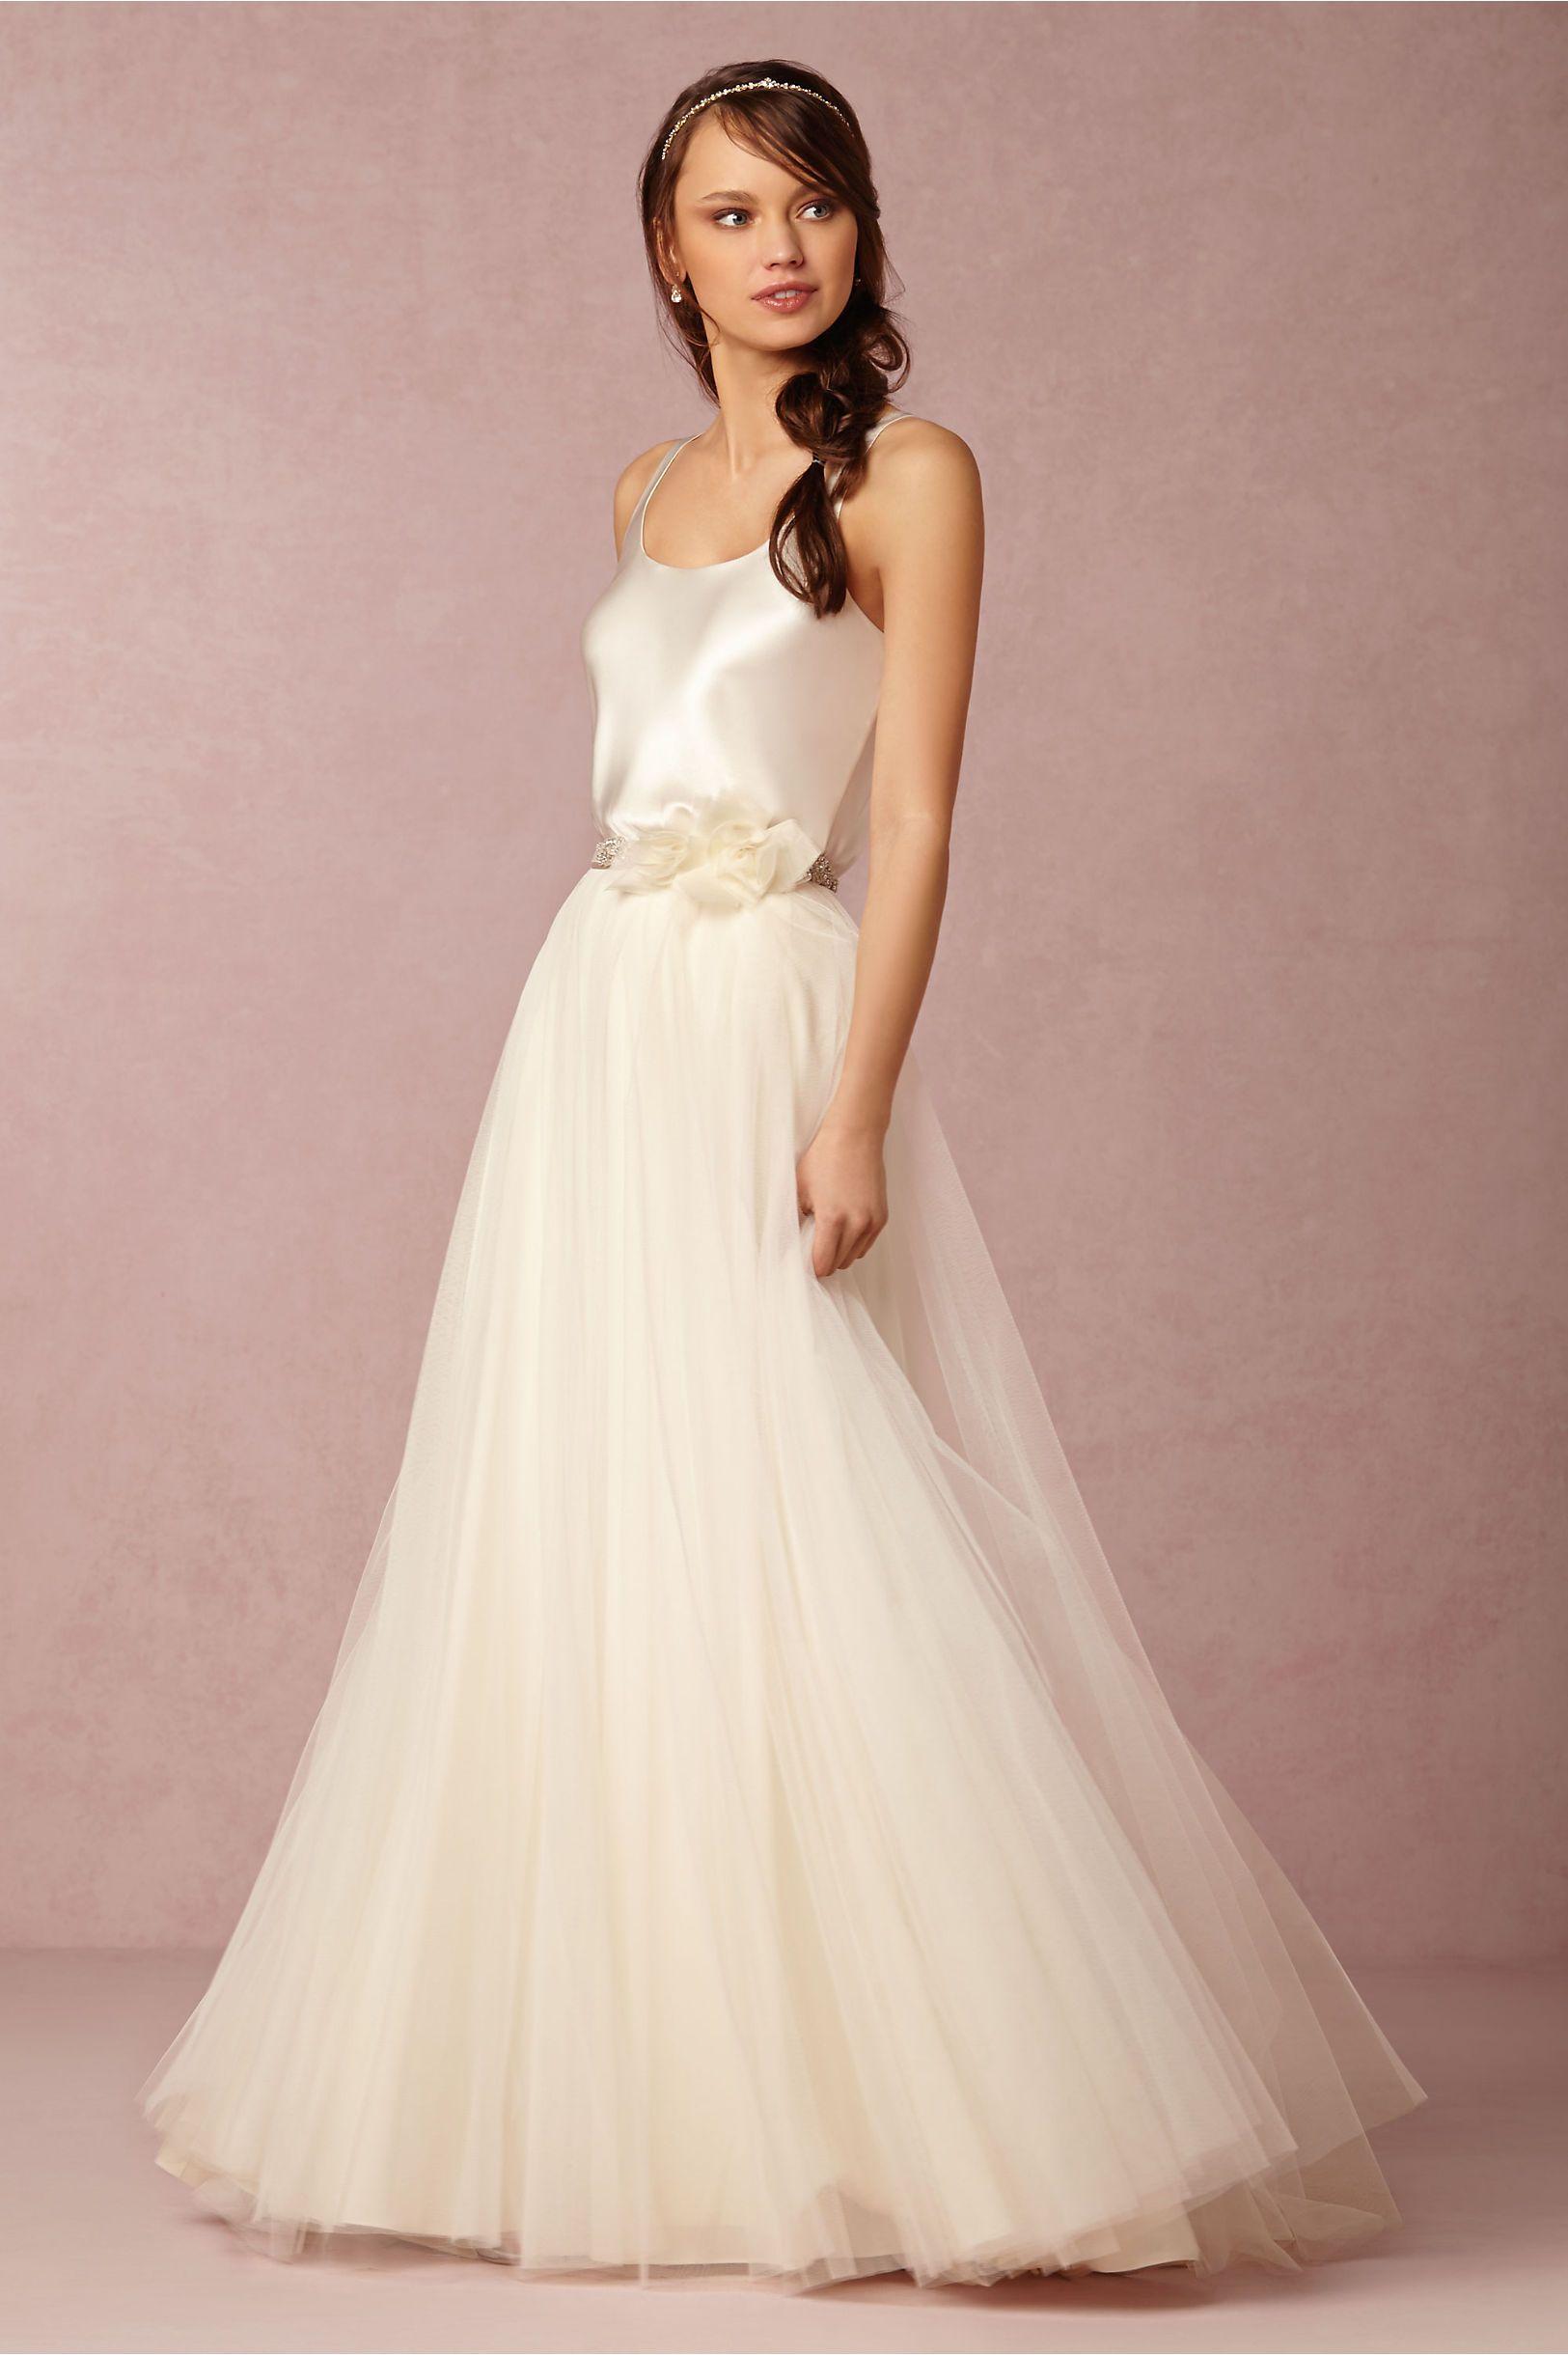 Gracia Skirt in Sale at BHLDN | Boda • Ambientación | Pinterest ...